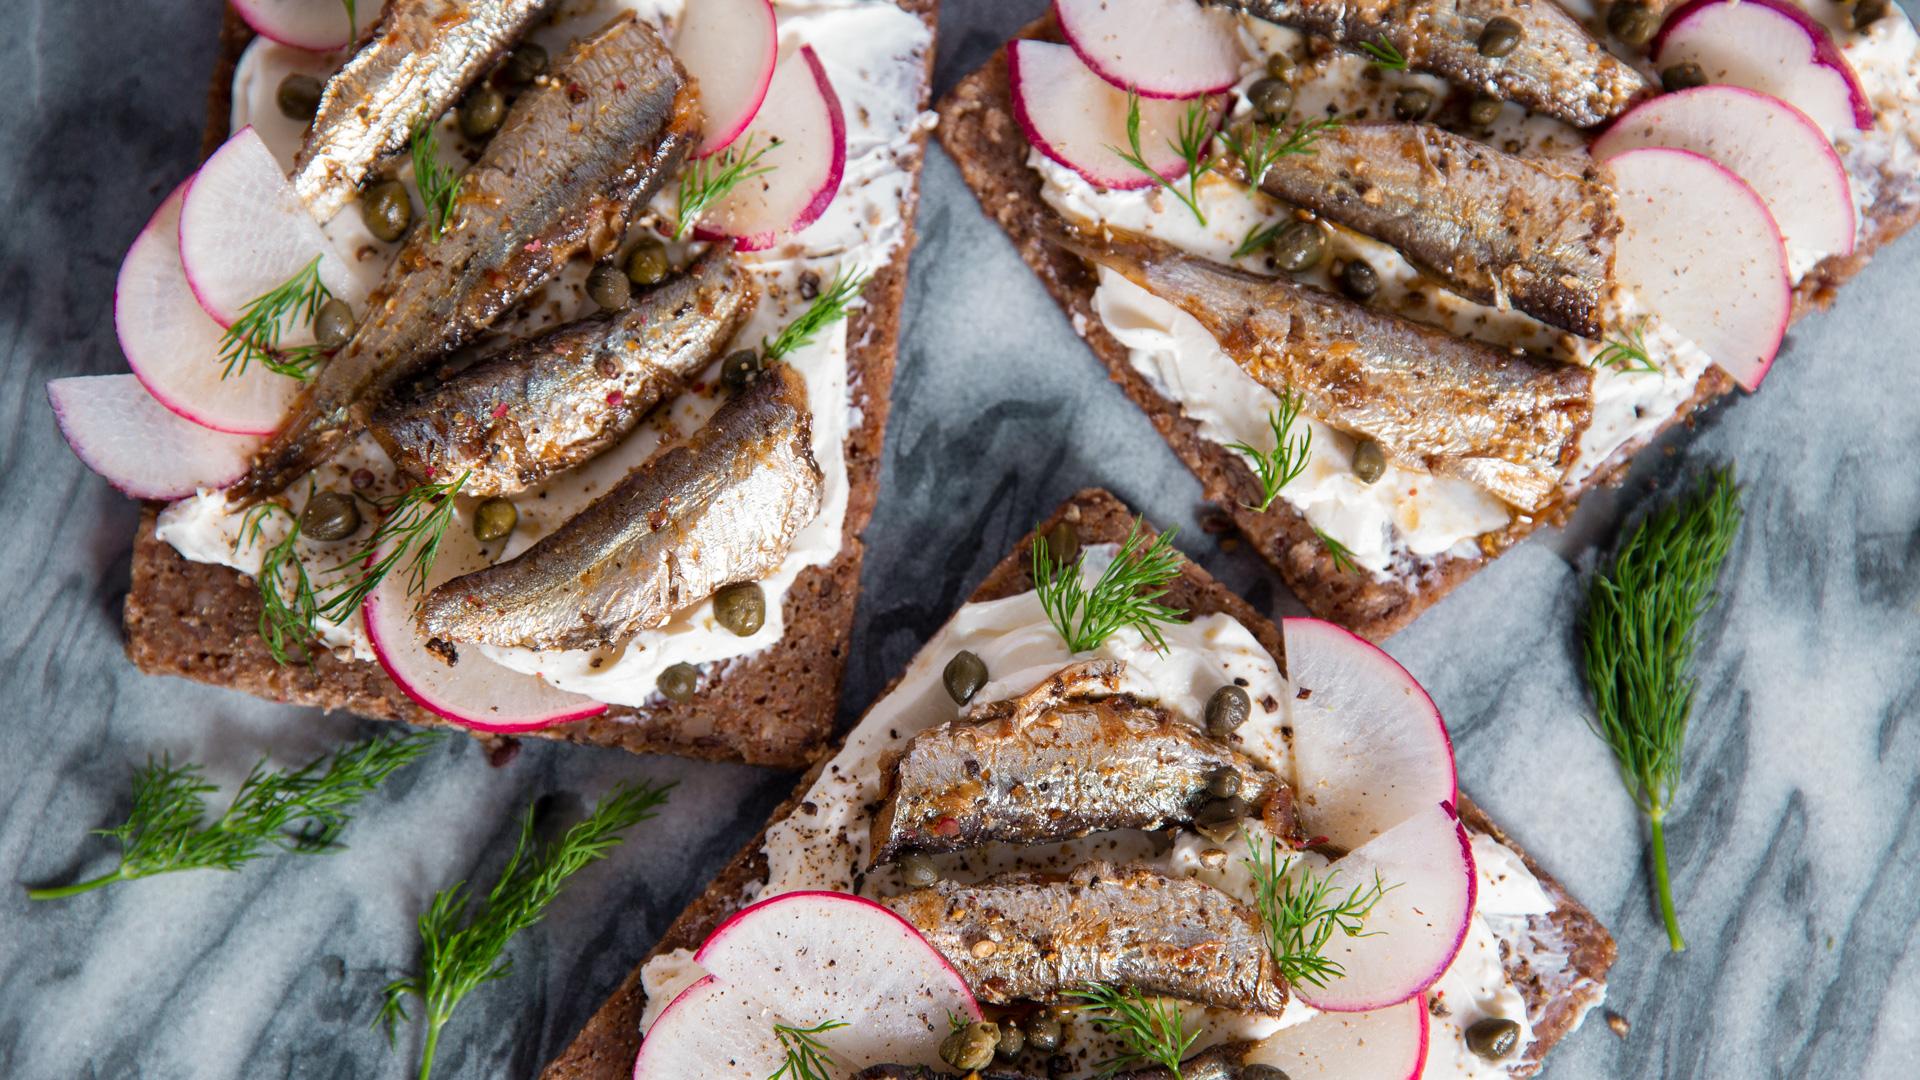 Classic Sardines On Rye